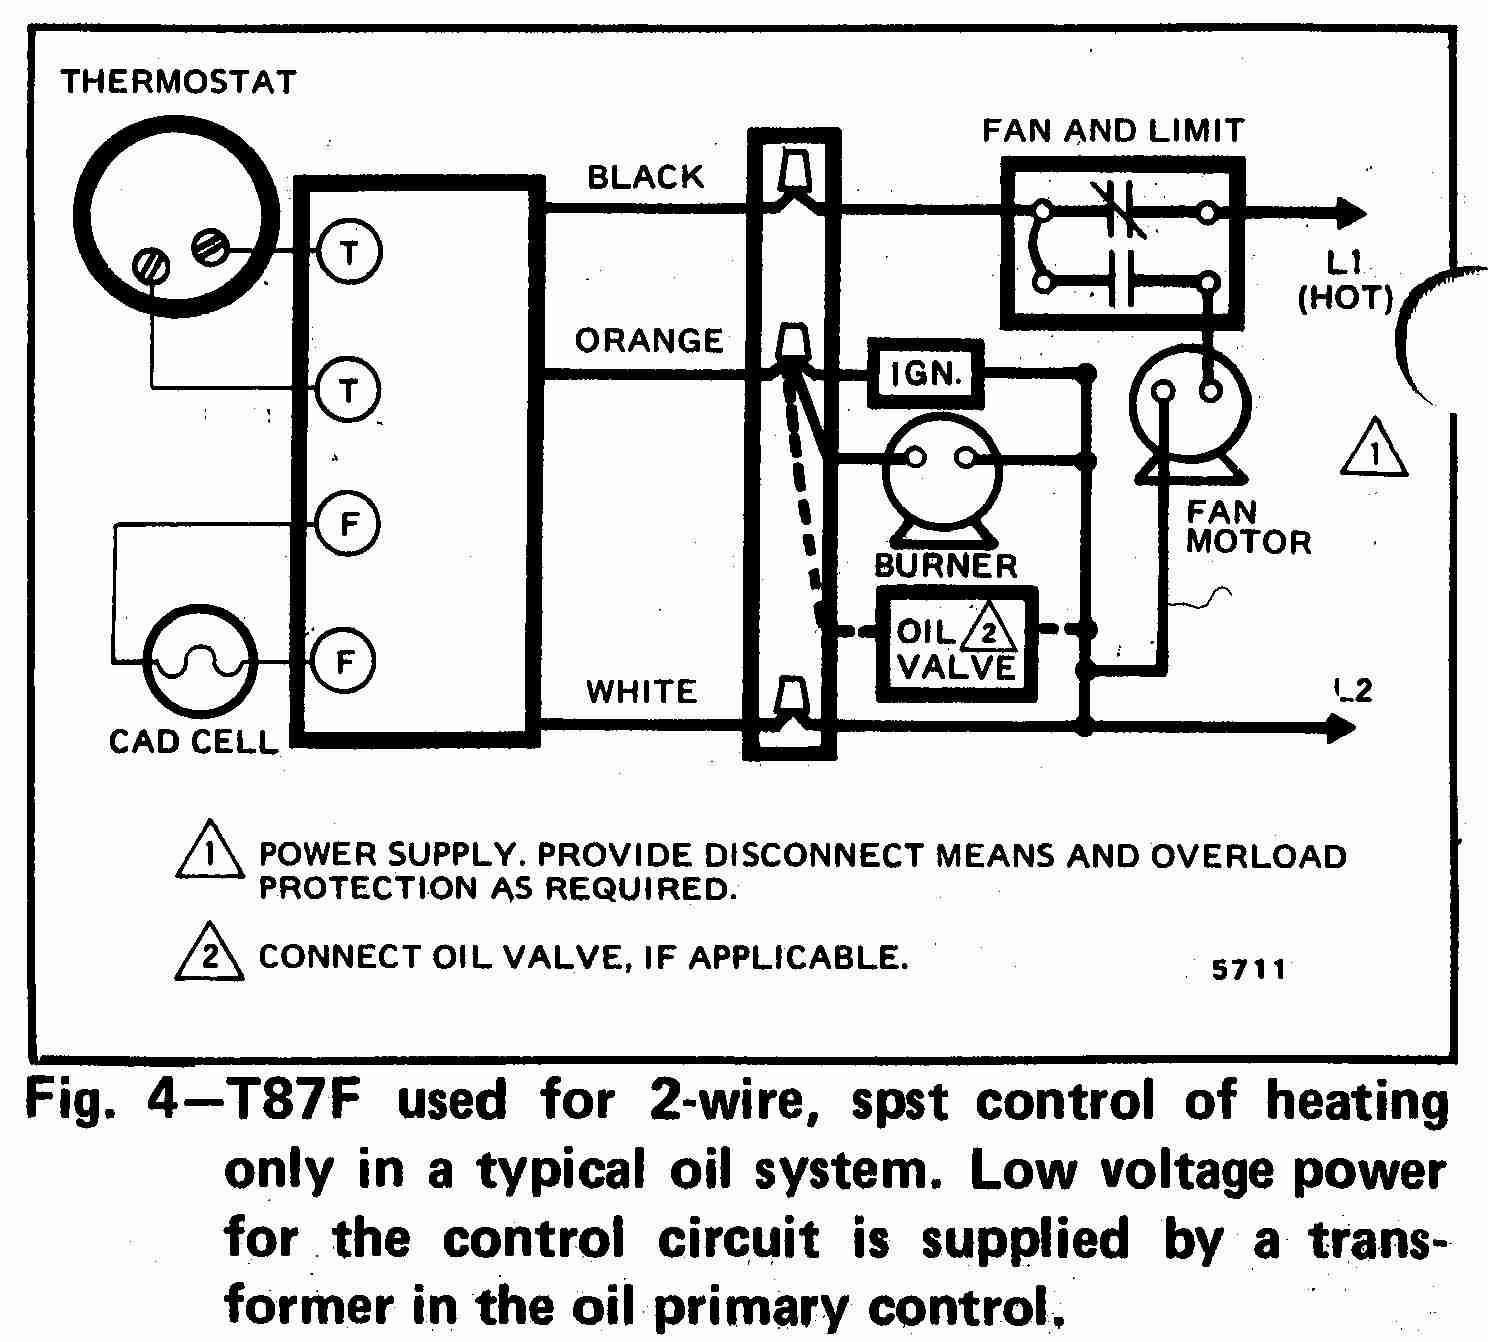 American Standard Furnace Wiring Diagram Elegant Heat Pump thermostat Wiring Diagram Diagram Of American Standard Furnace Wiring Diagram